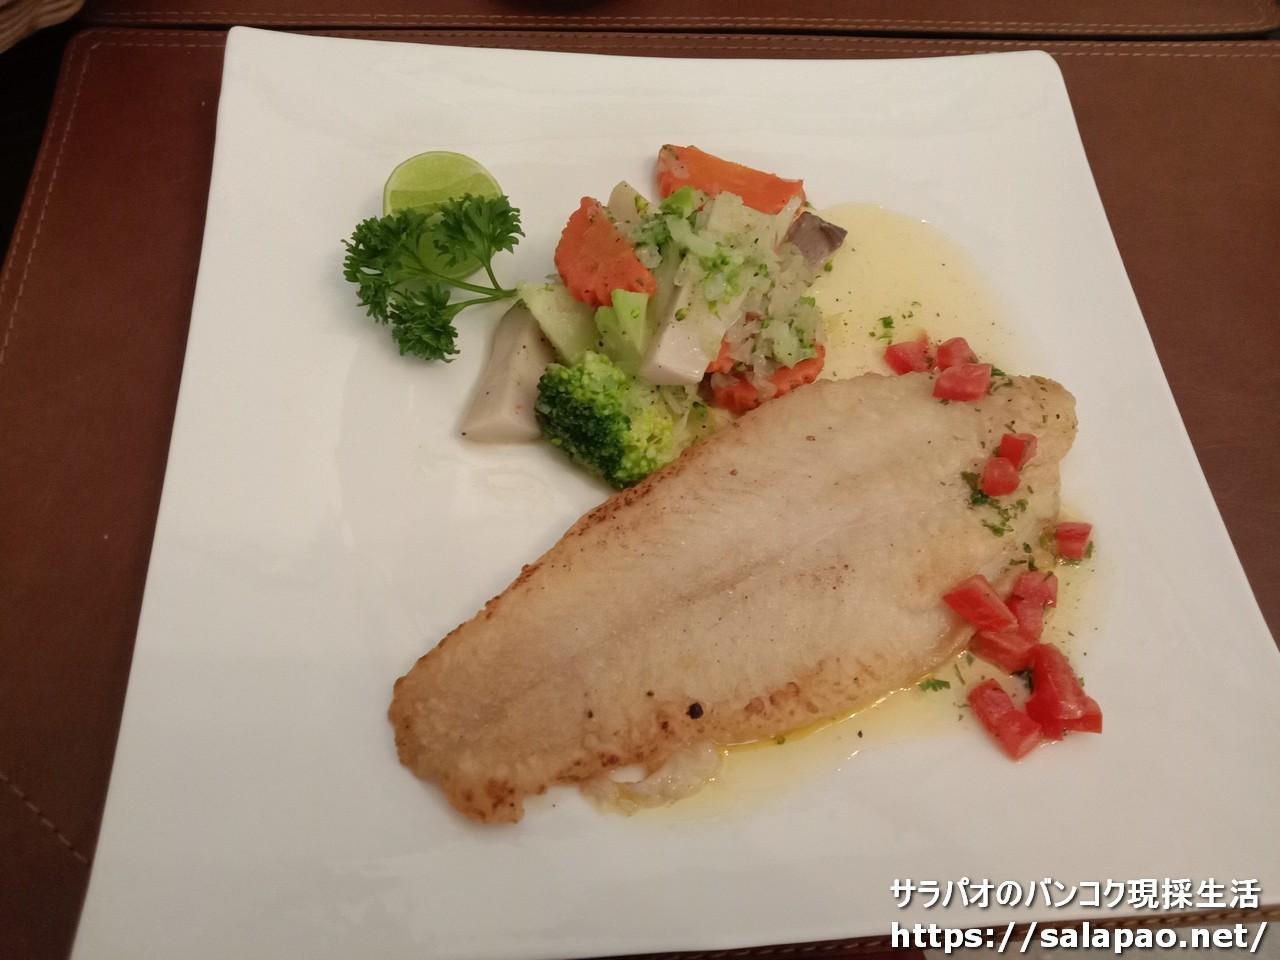 JPのランチメニューは399バーツでフランス料理が食べれて超お得! in アソーク